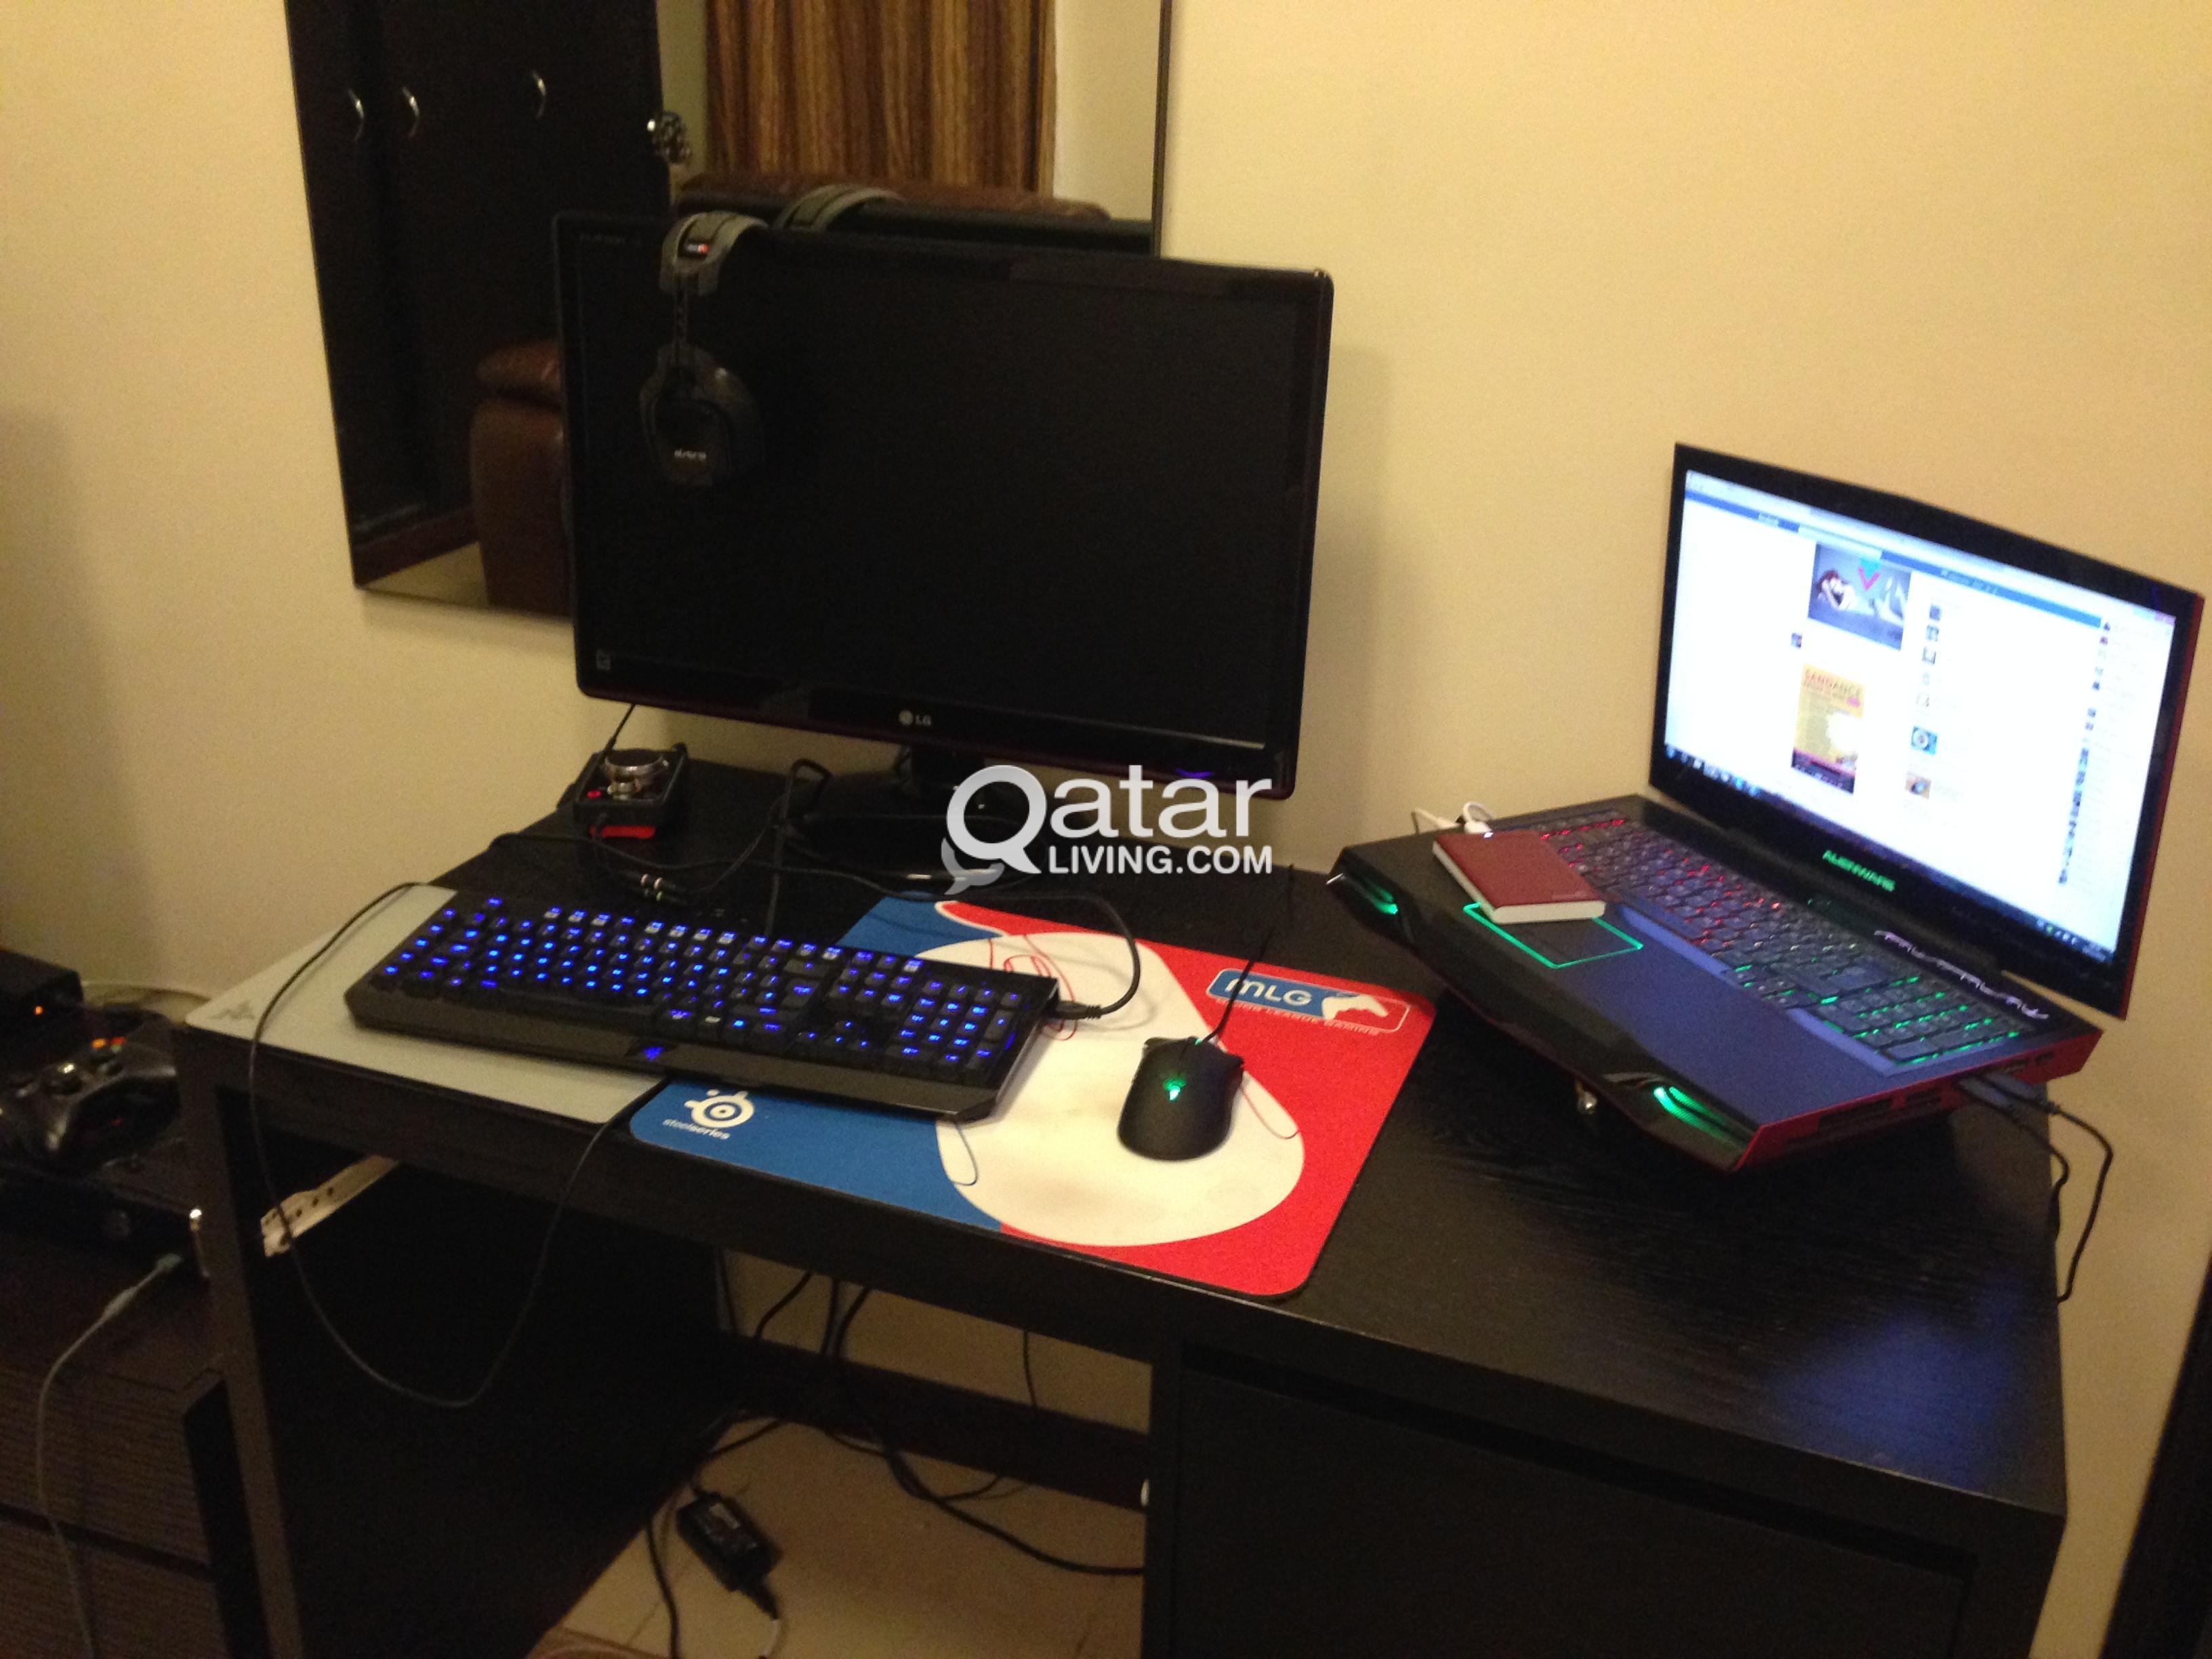 Alienware M18x i7-2670QM, Astro Gaming Headset, LG Gaming